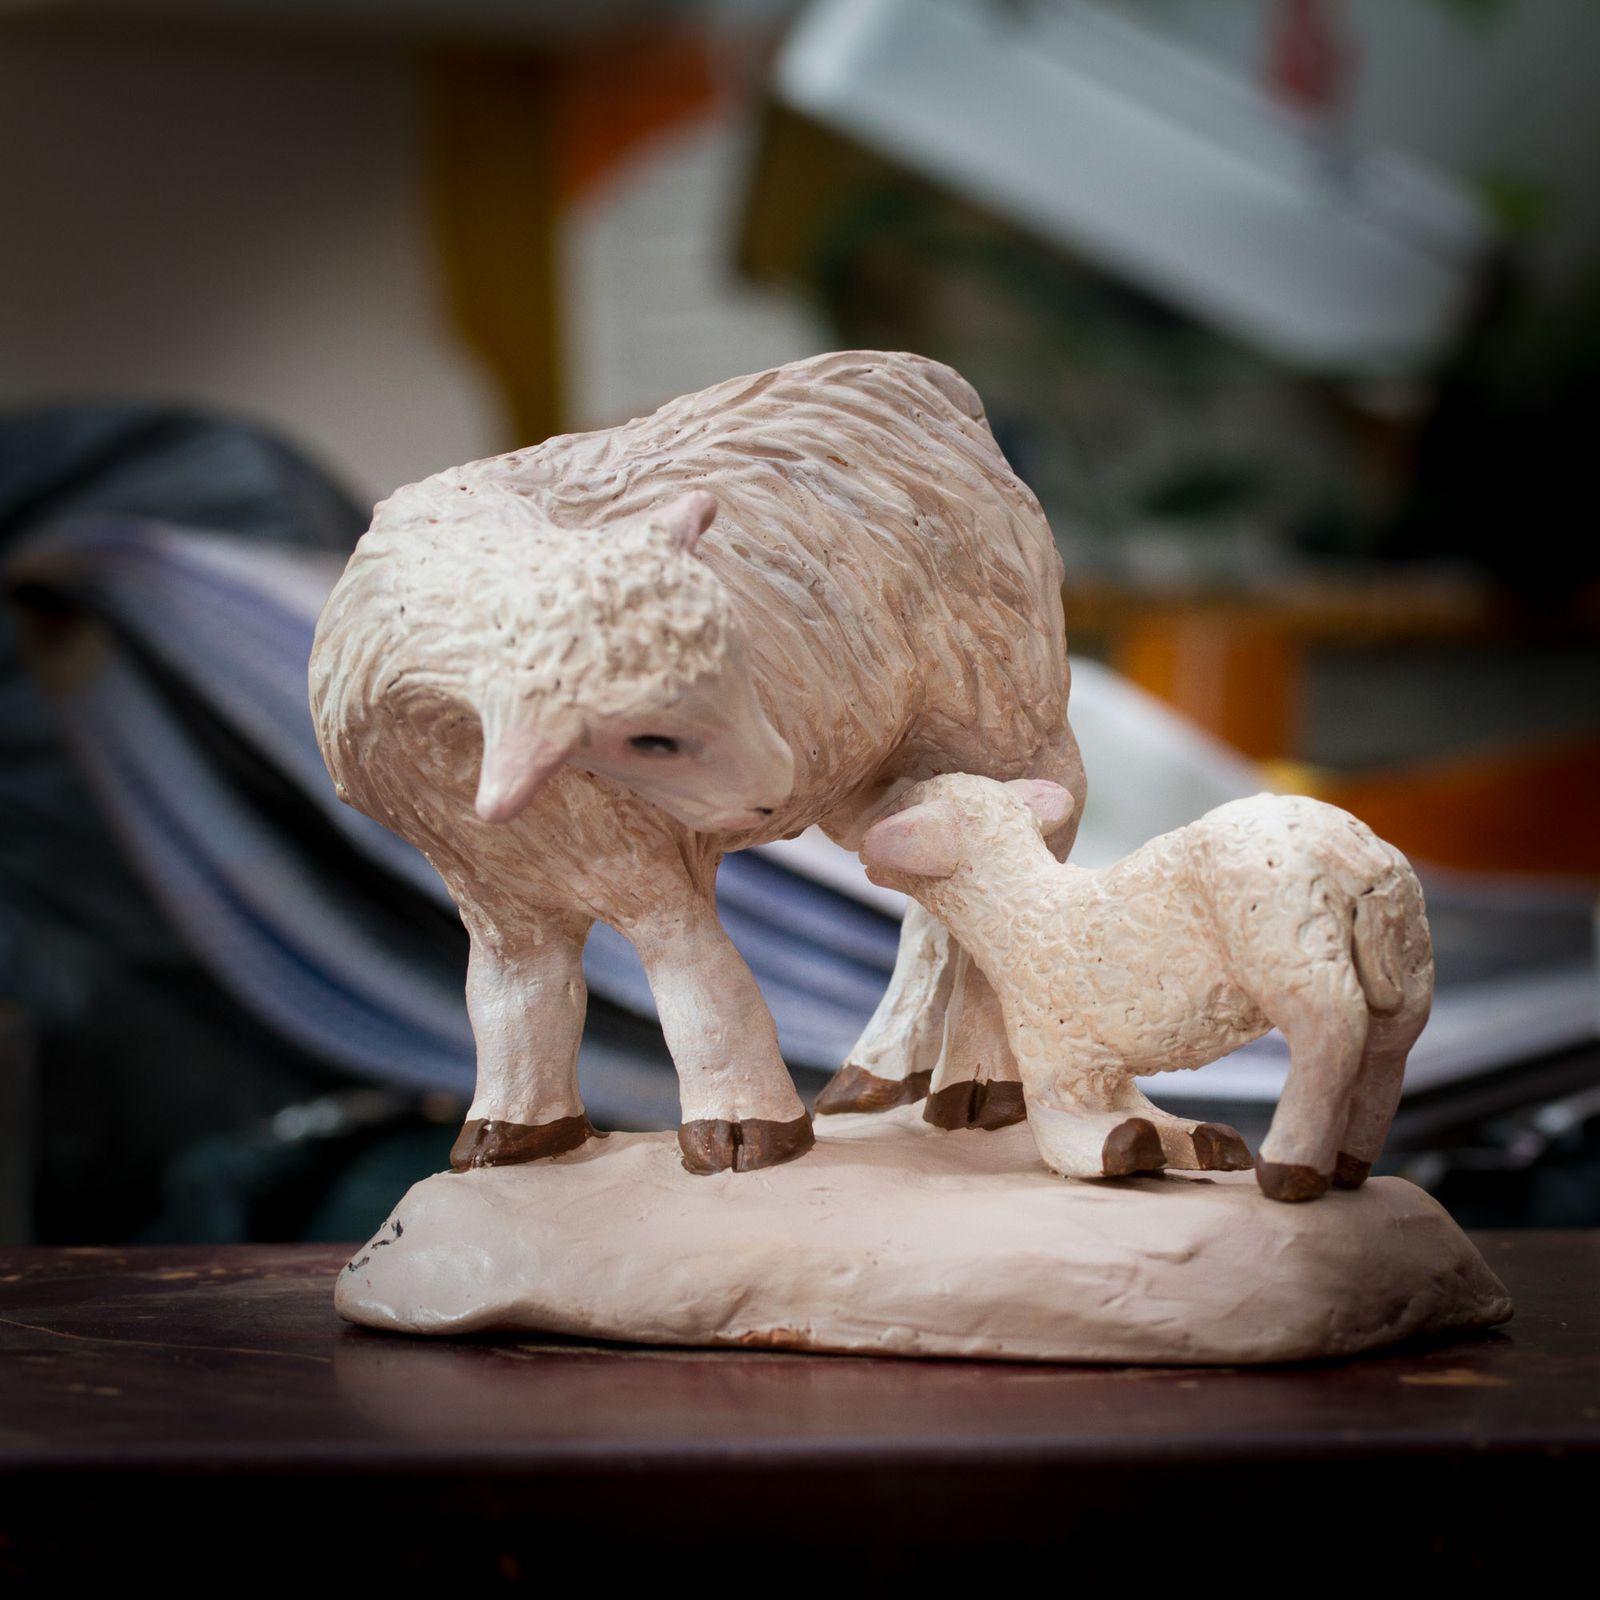 brebis allaitant son agneau pour santons de 26 cm (santon Evelyne Arnaud Toulon)